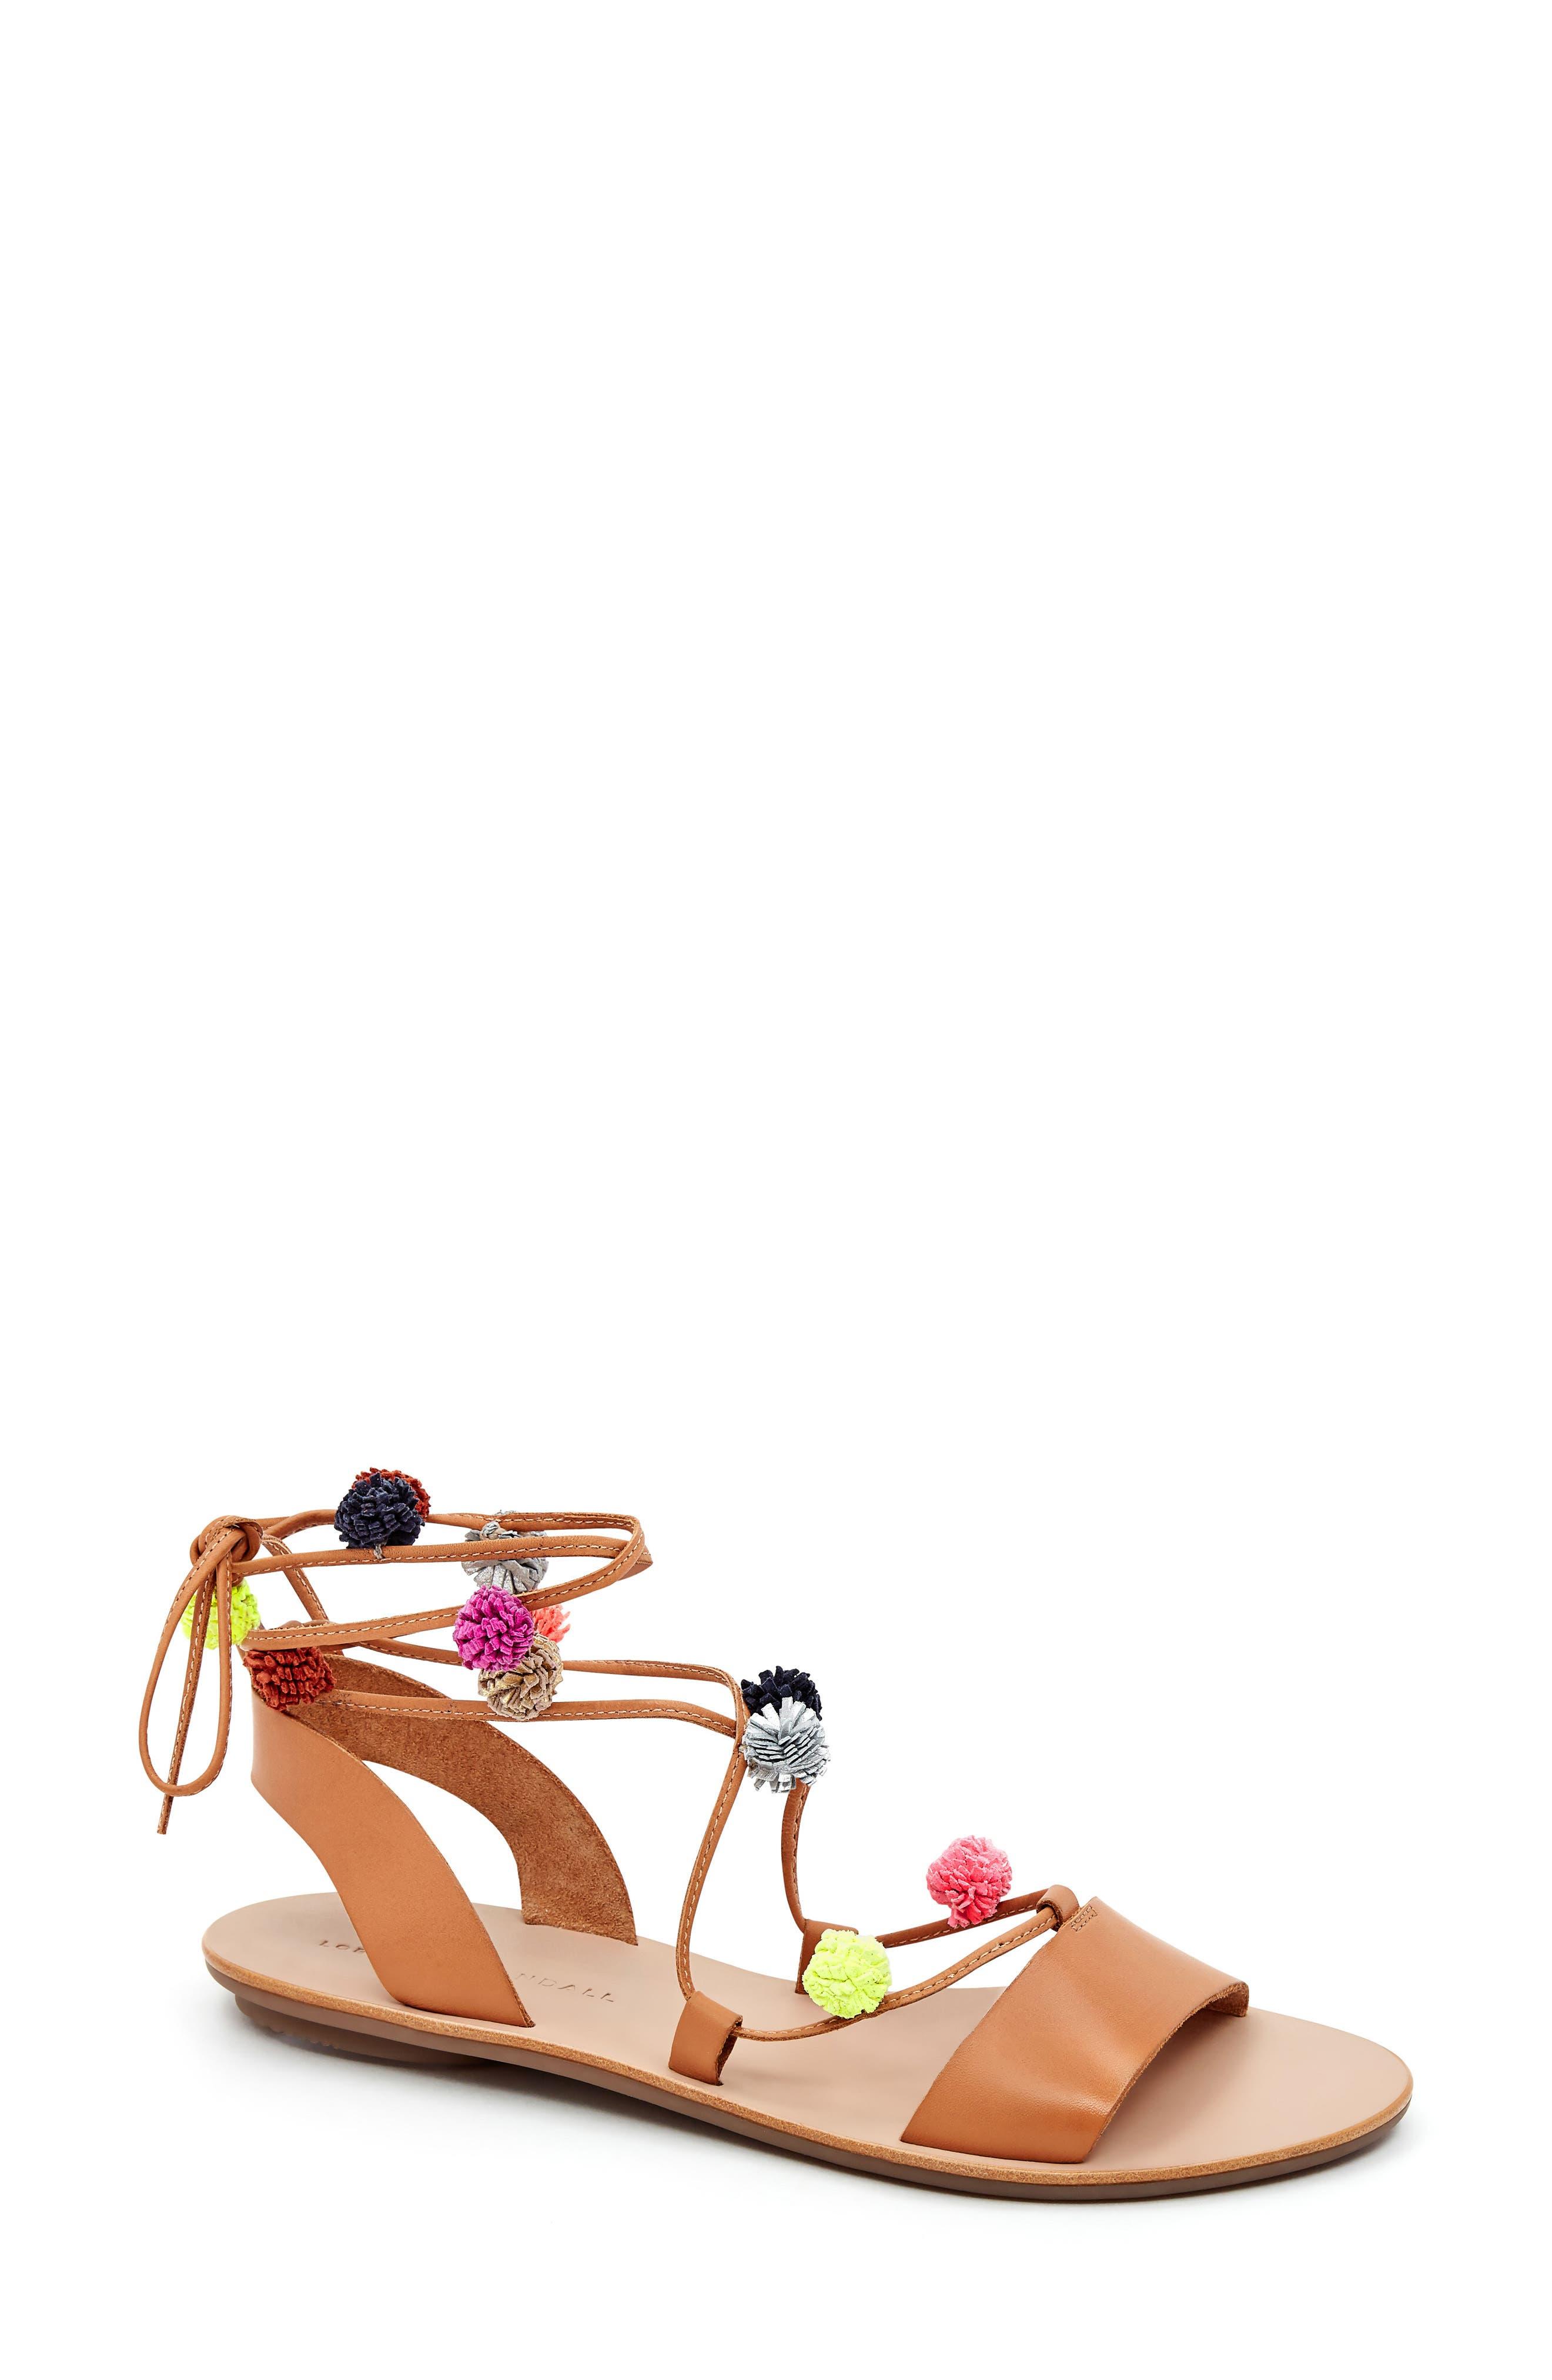 Loeffler Randall 'Saskia' Flat Sandal (Women)